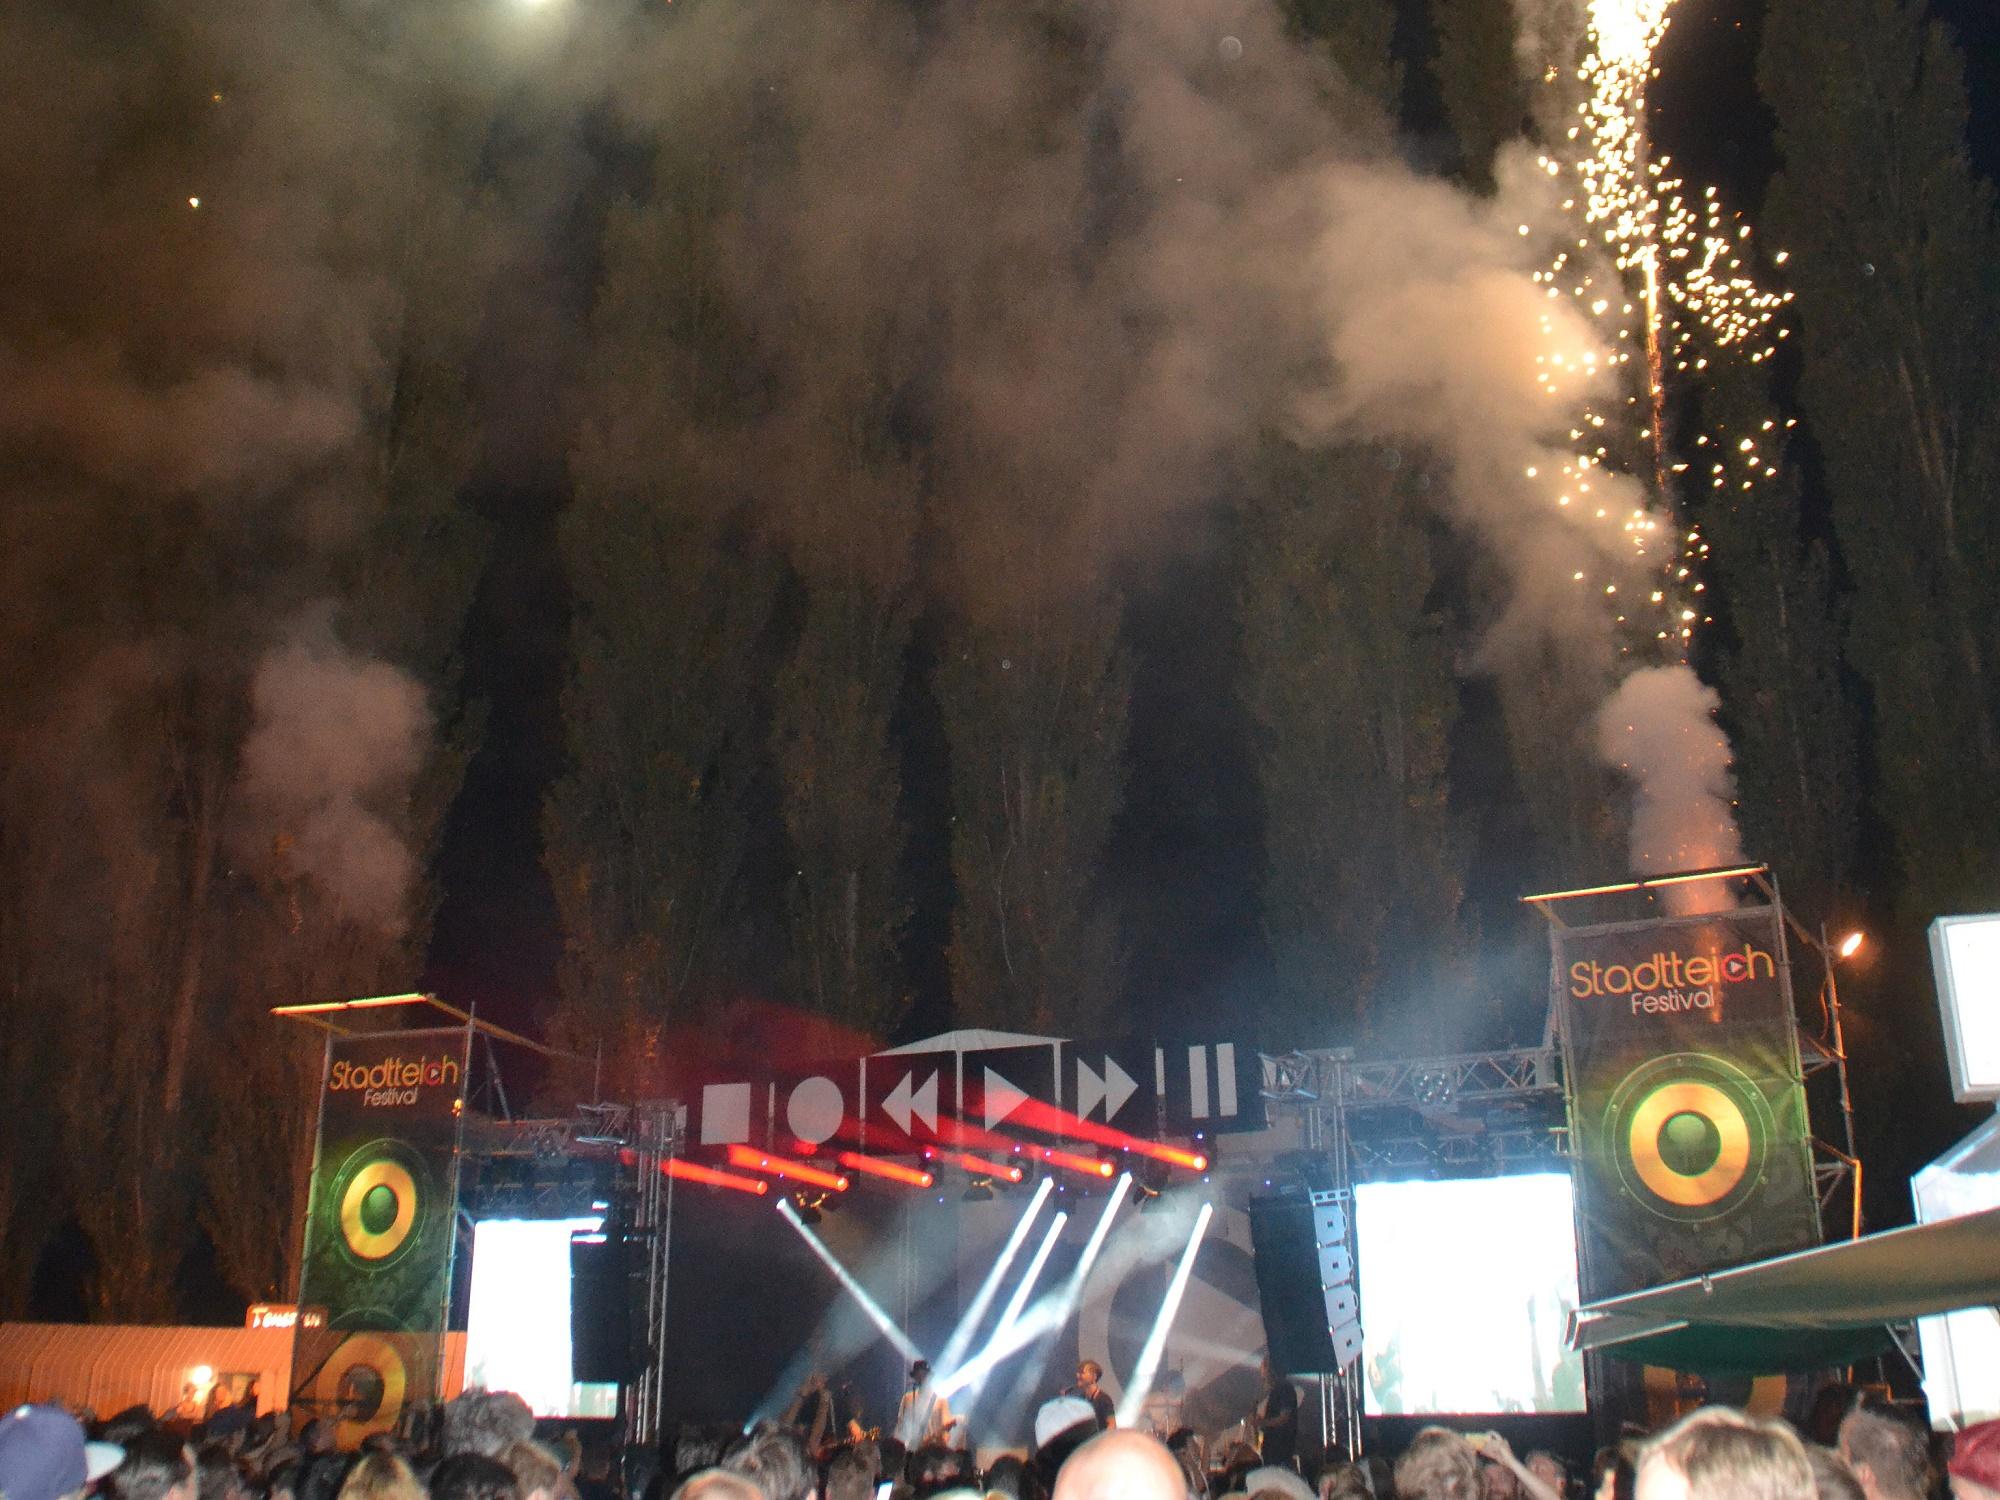 Stadtteichfestival_3